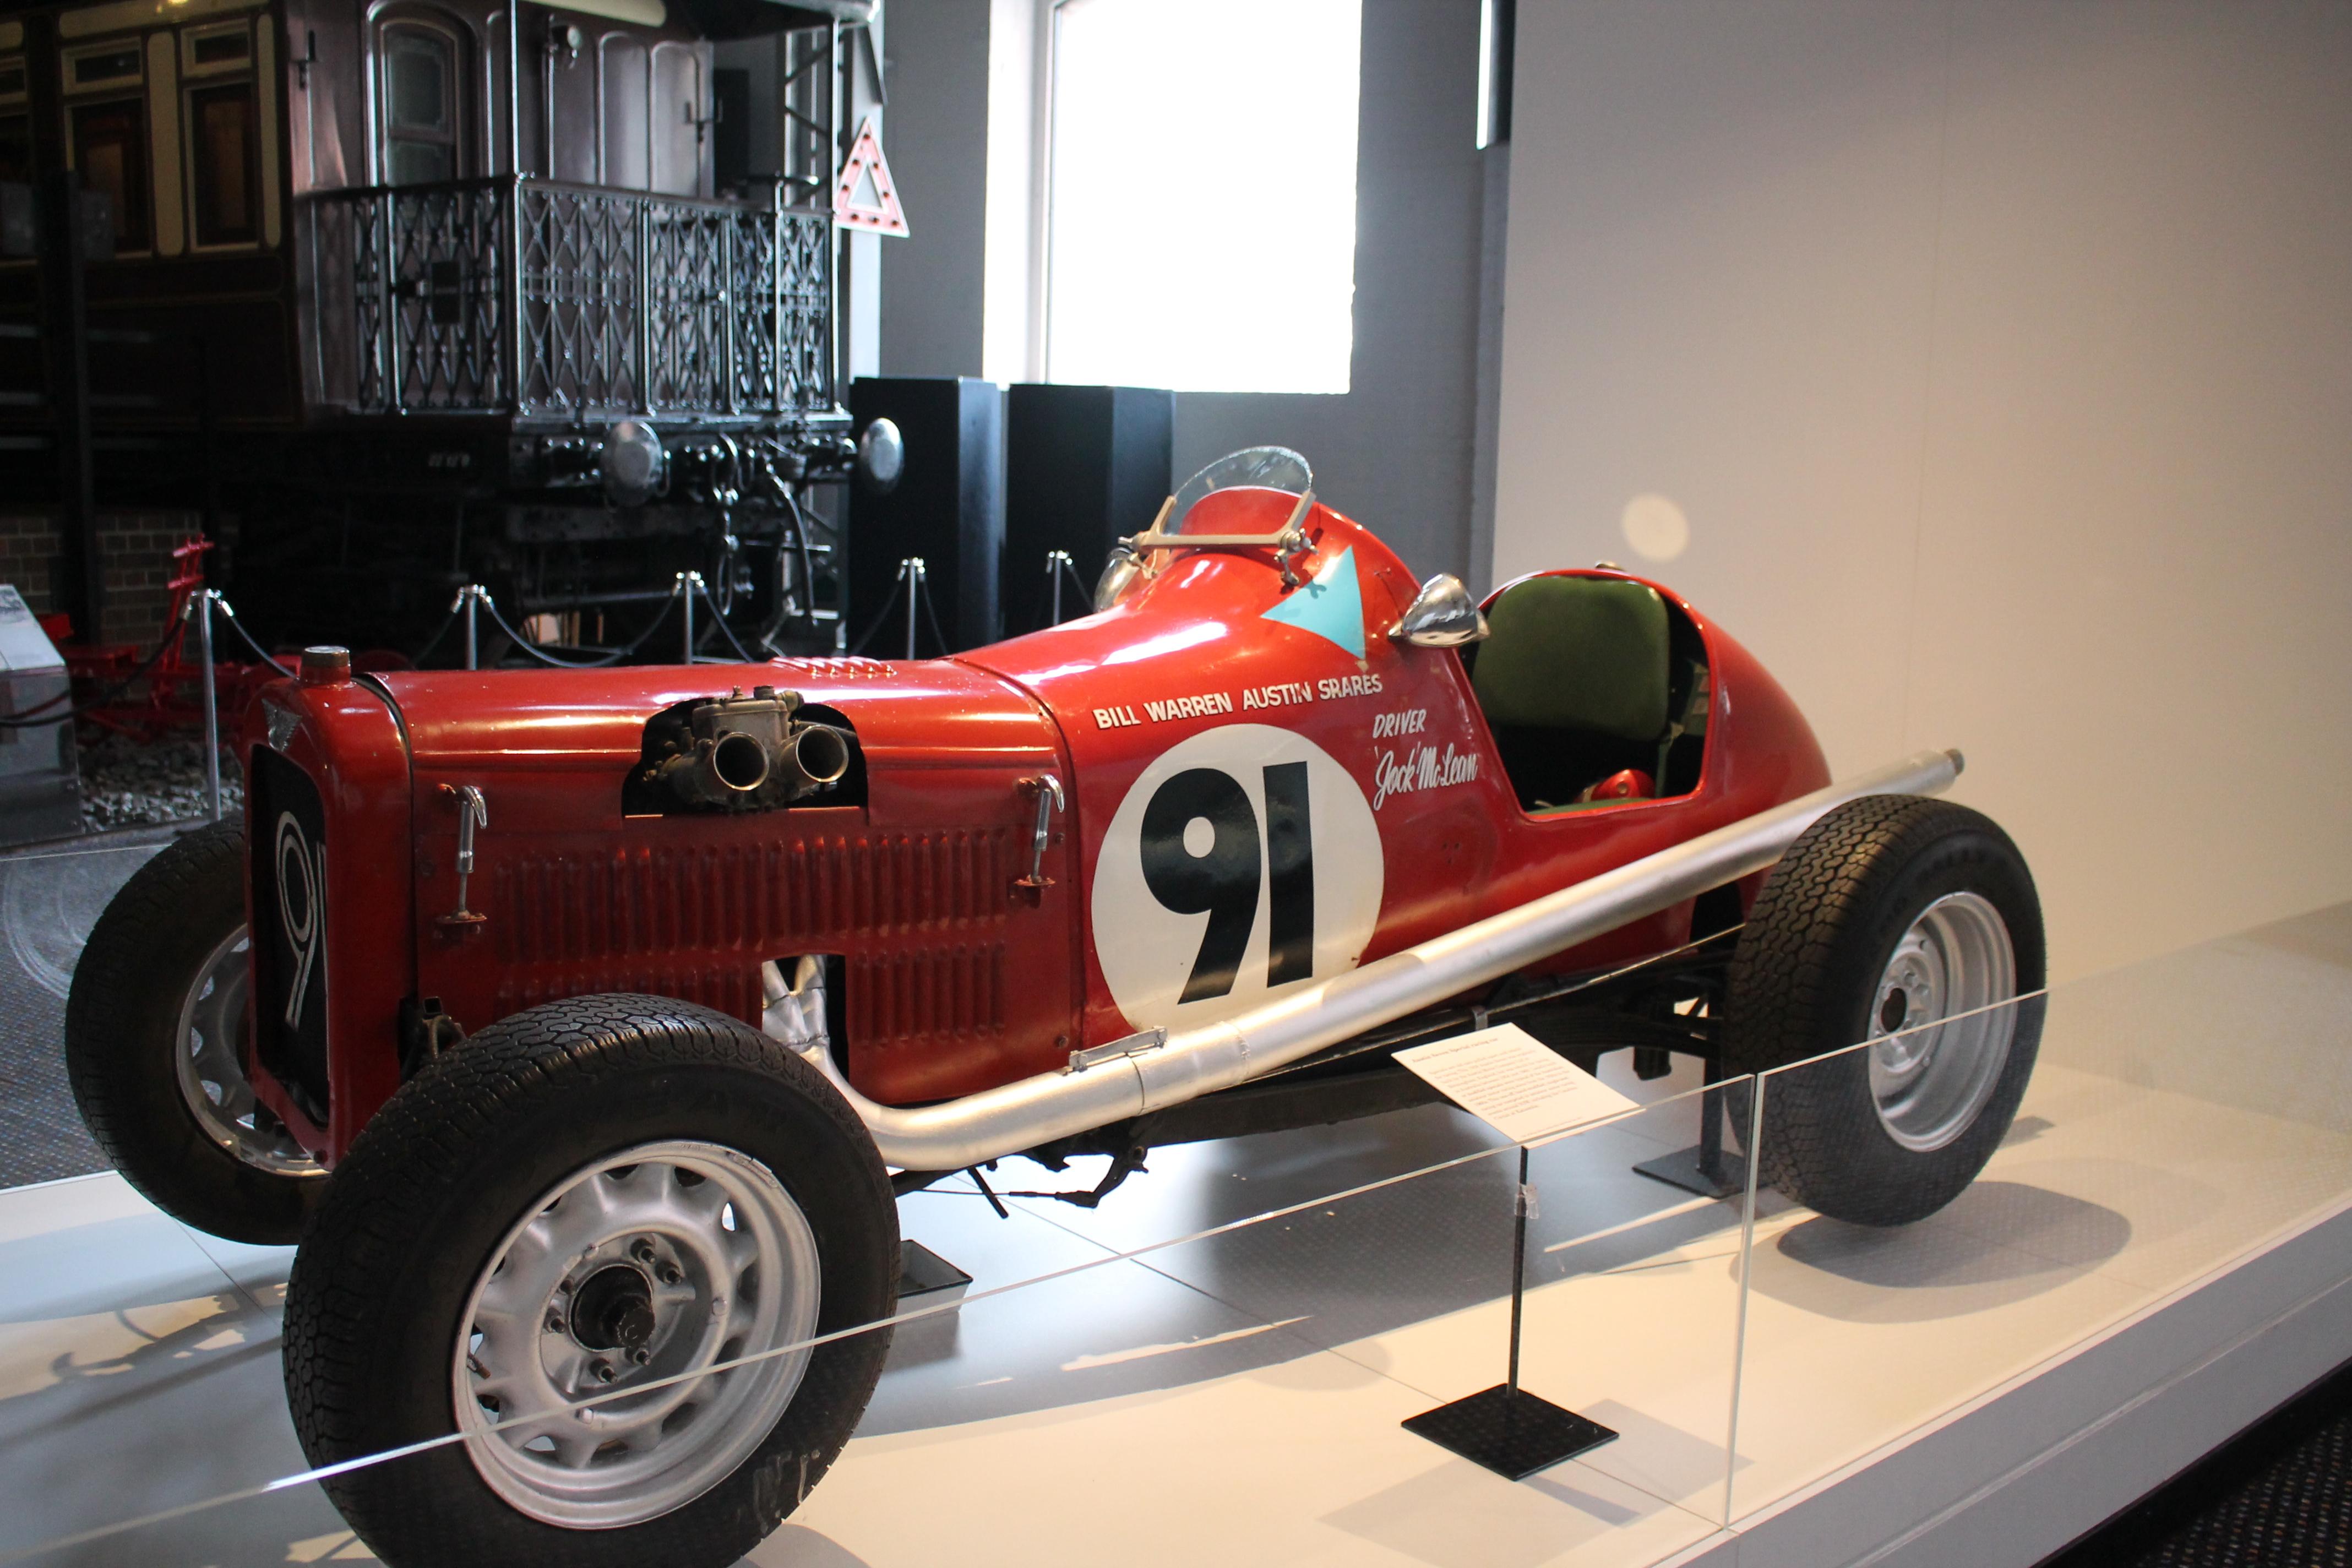 Racing Car in History